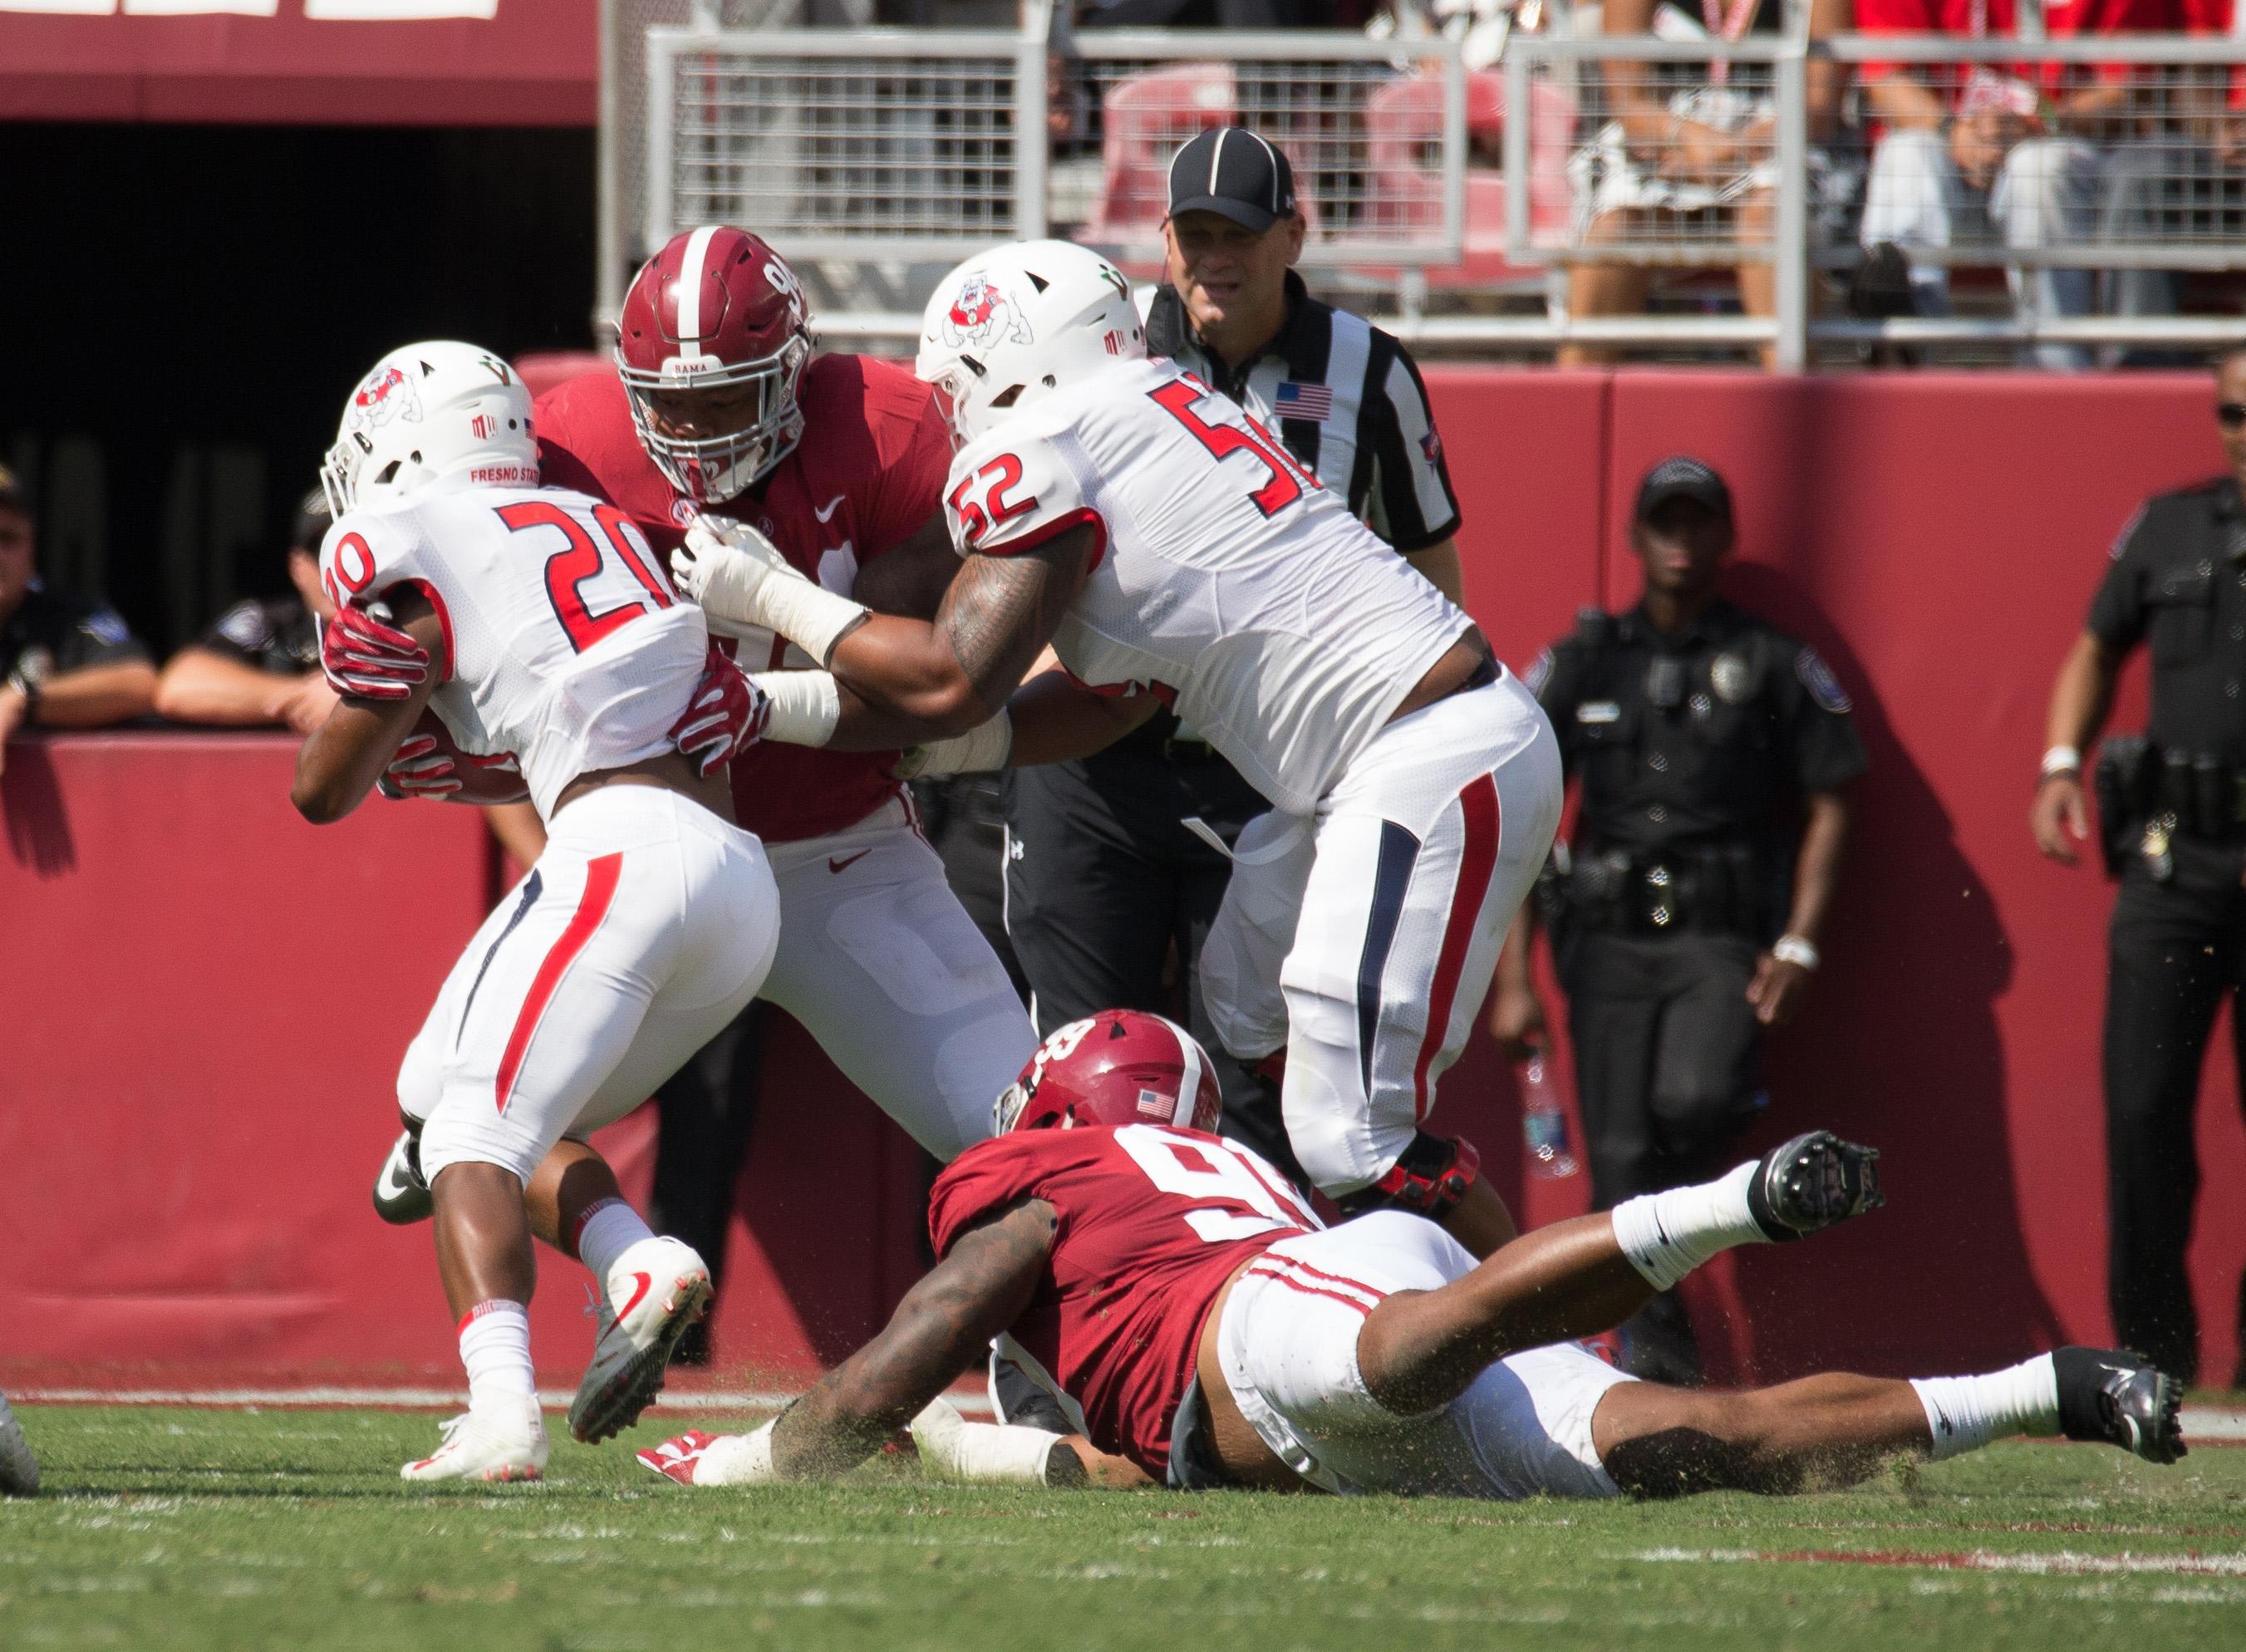 Alabama Crimson Tide defensive lineman Da'Ron Payne (94) is blocked by Fresno State Bulldogs offensive lineman Netane Muti (52) as he tackles Fresno State Bulldogs running back Ronnie Rivers (20) at Bryant-Denny Stadium.